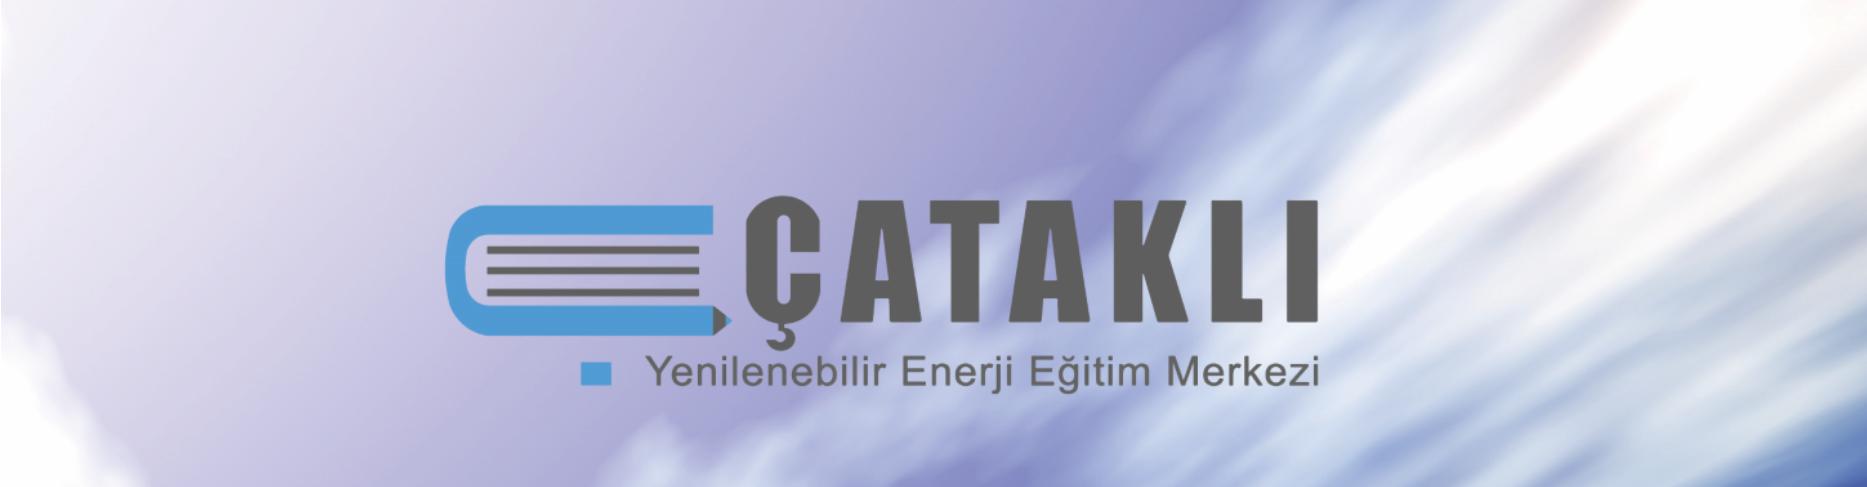 CATAKLILOGO